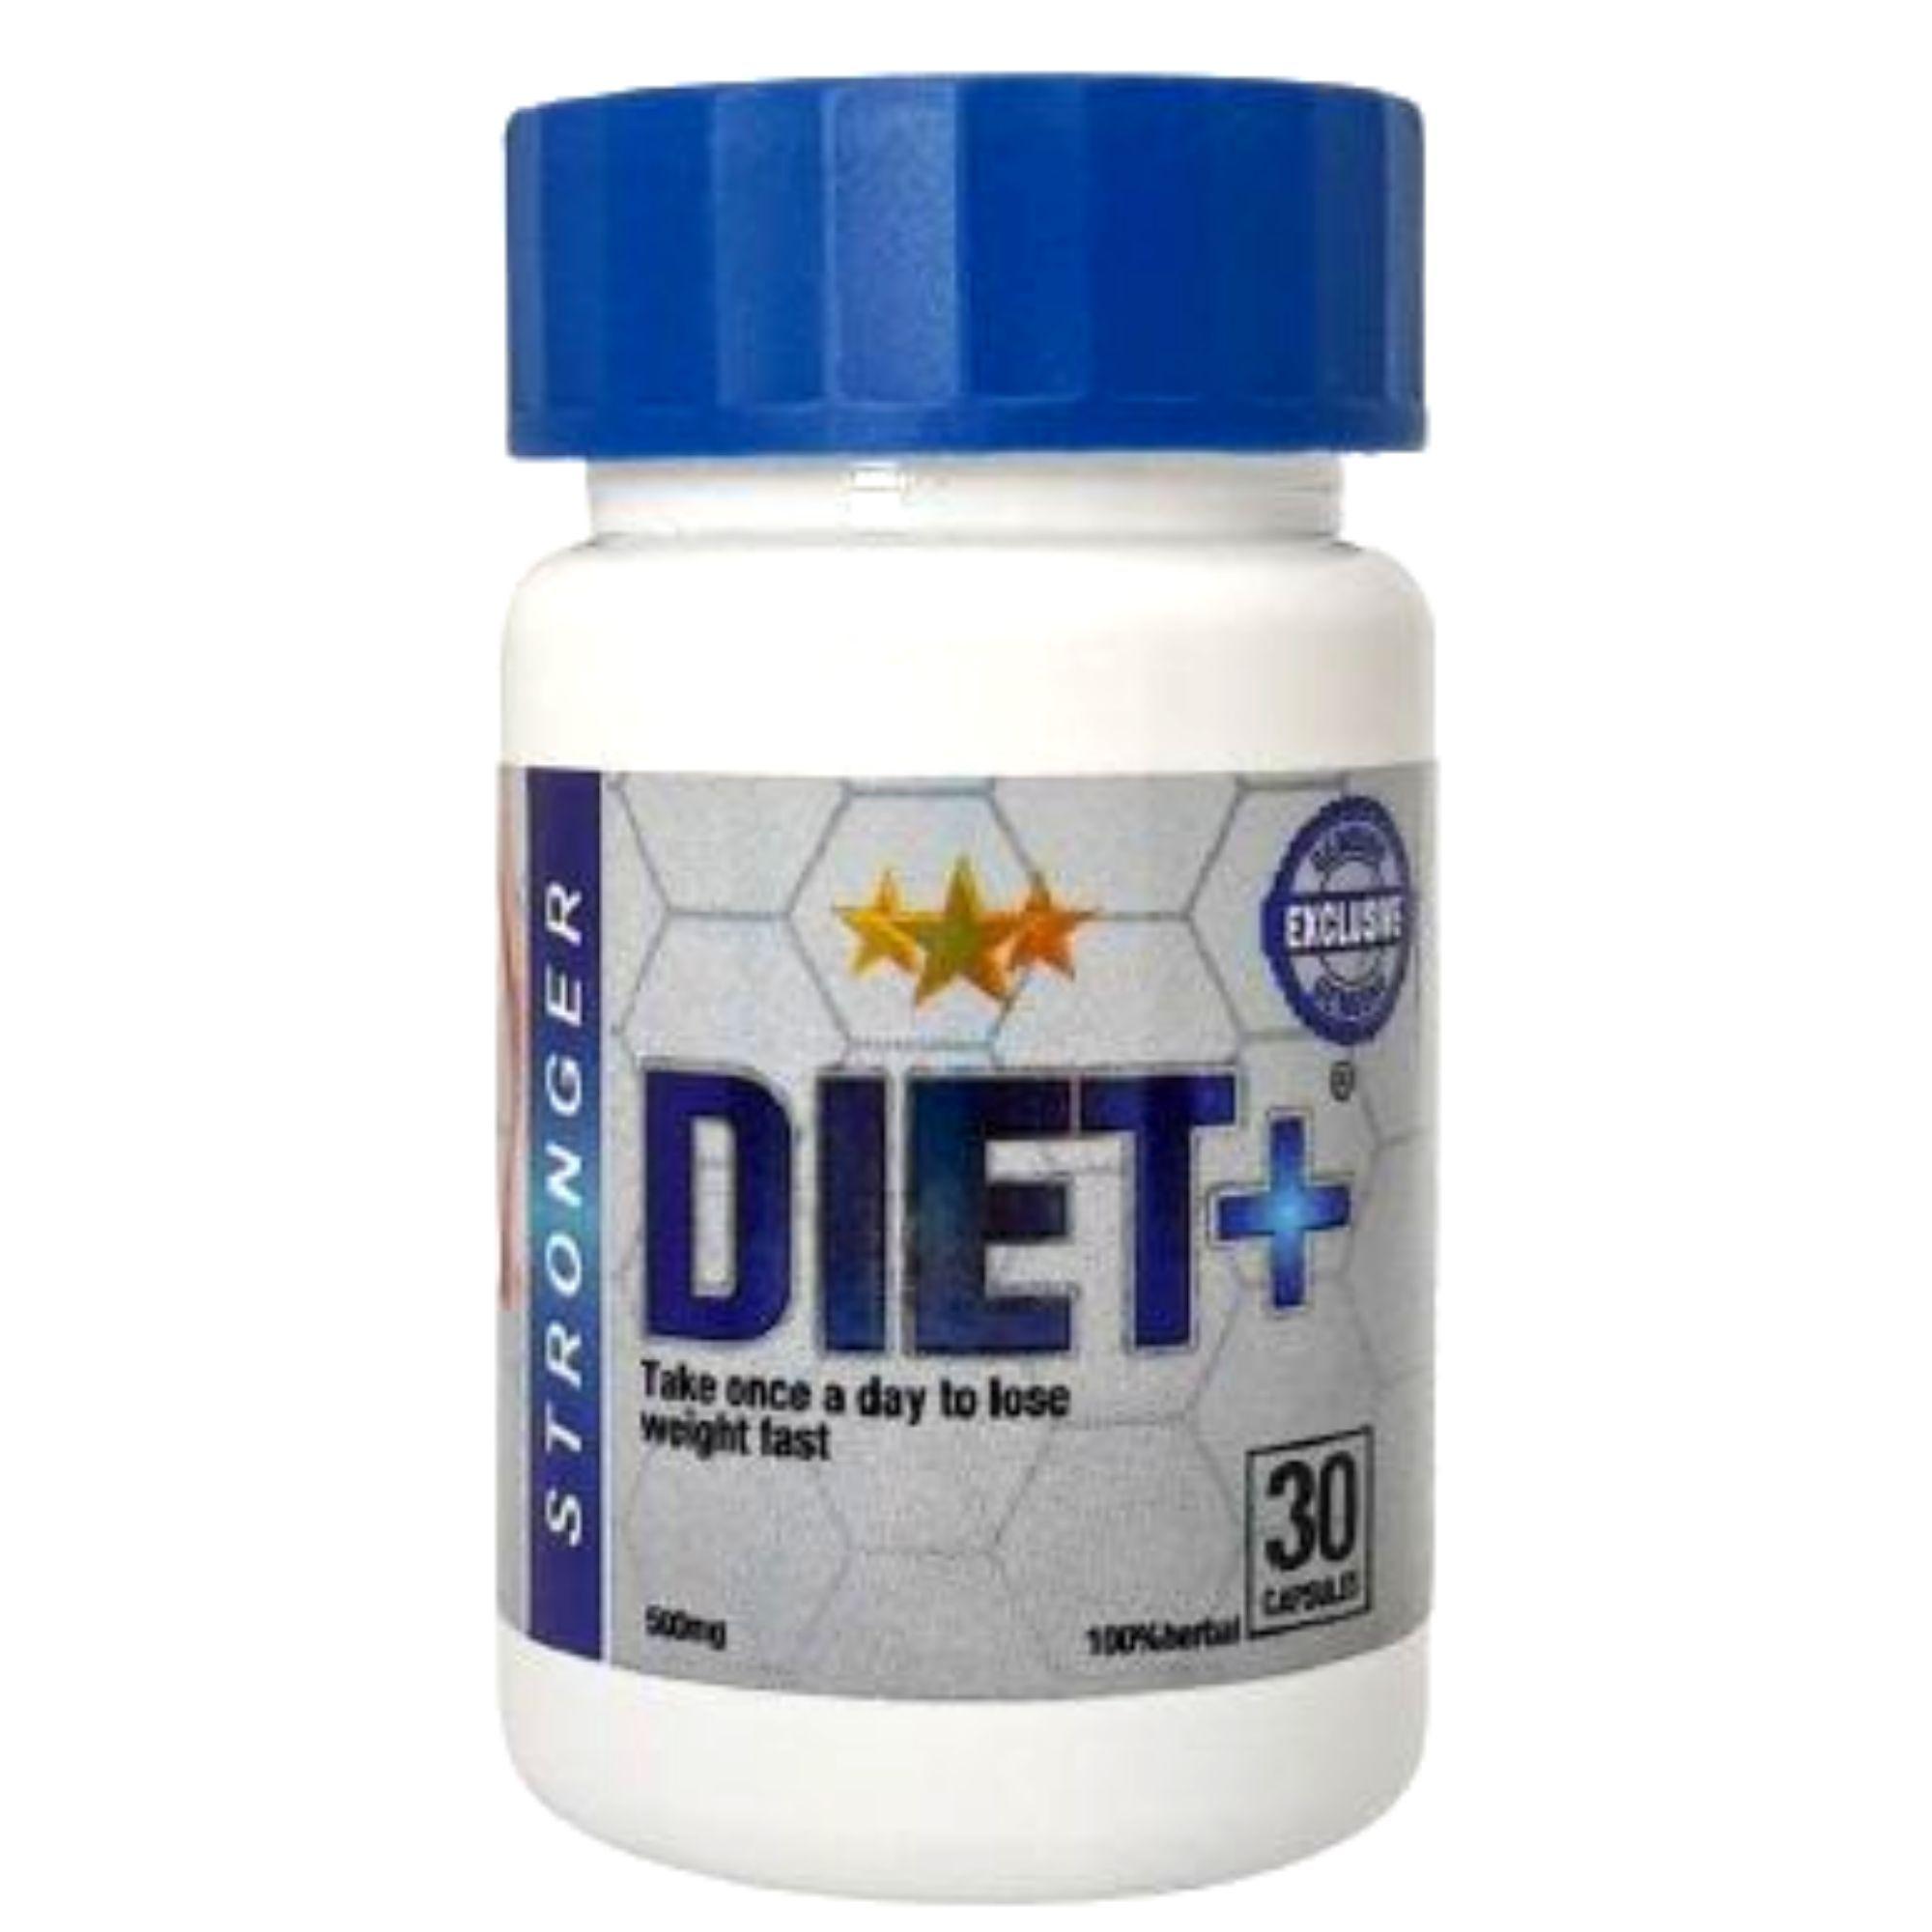 Diet + Stronger  original